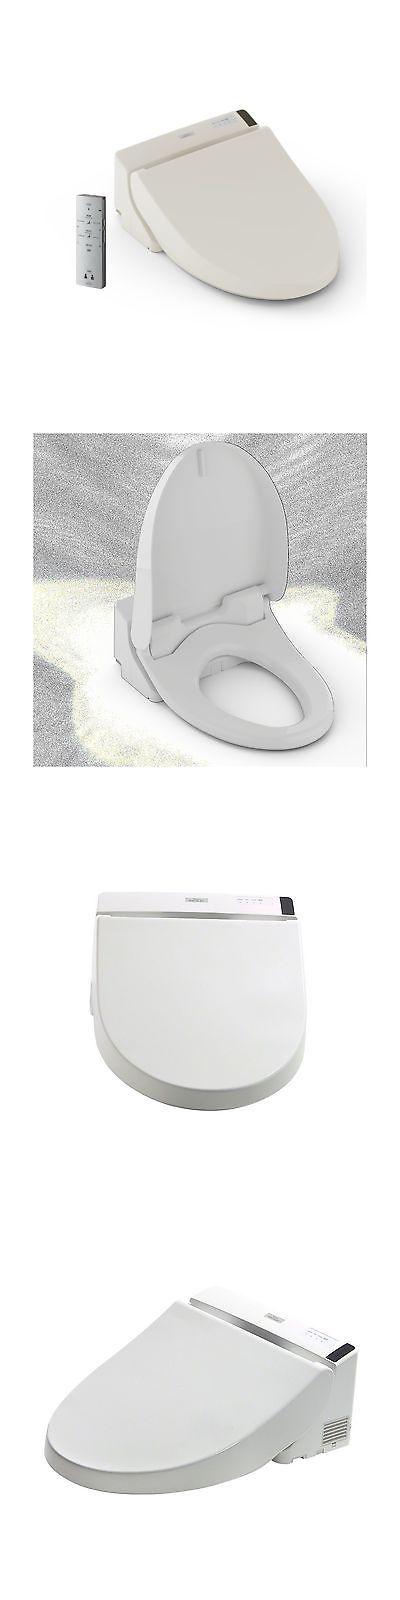 bidets and toilet attachments toto washlet c200 elongated bidet toilet seat with premist sedona